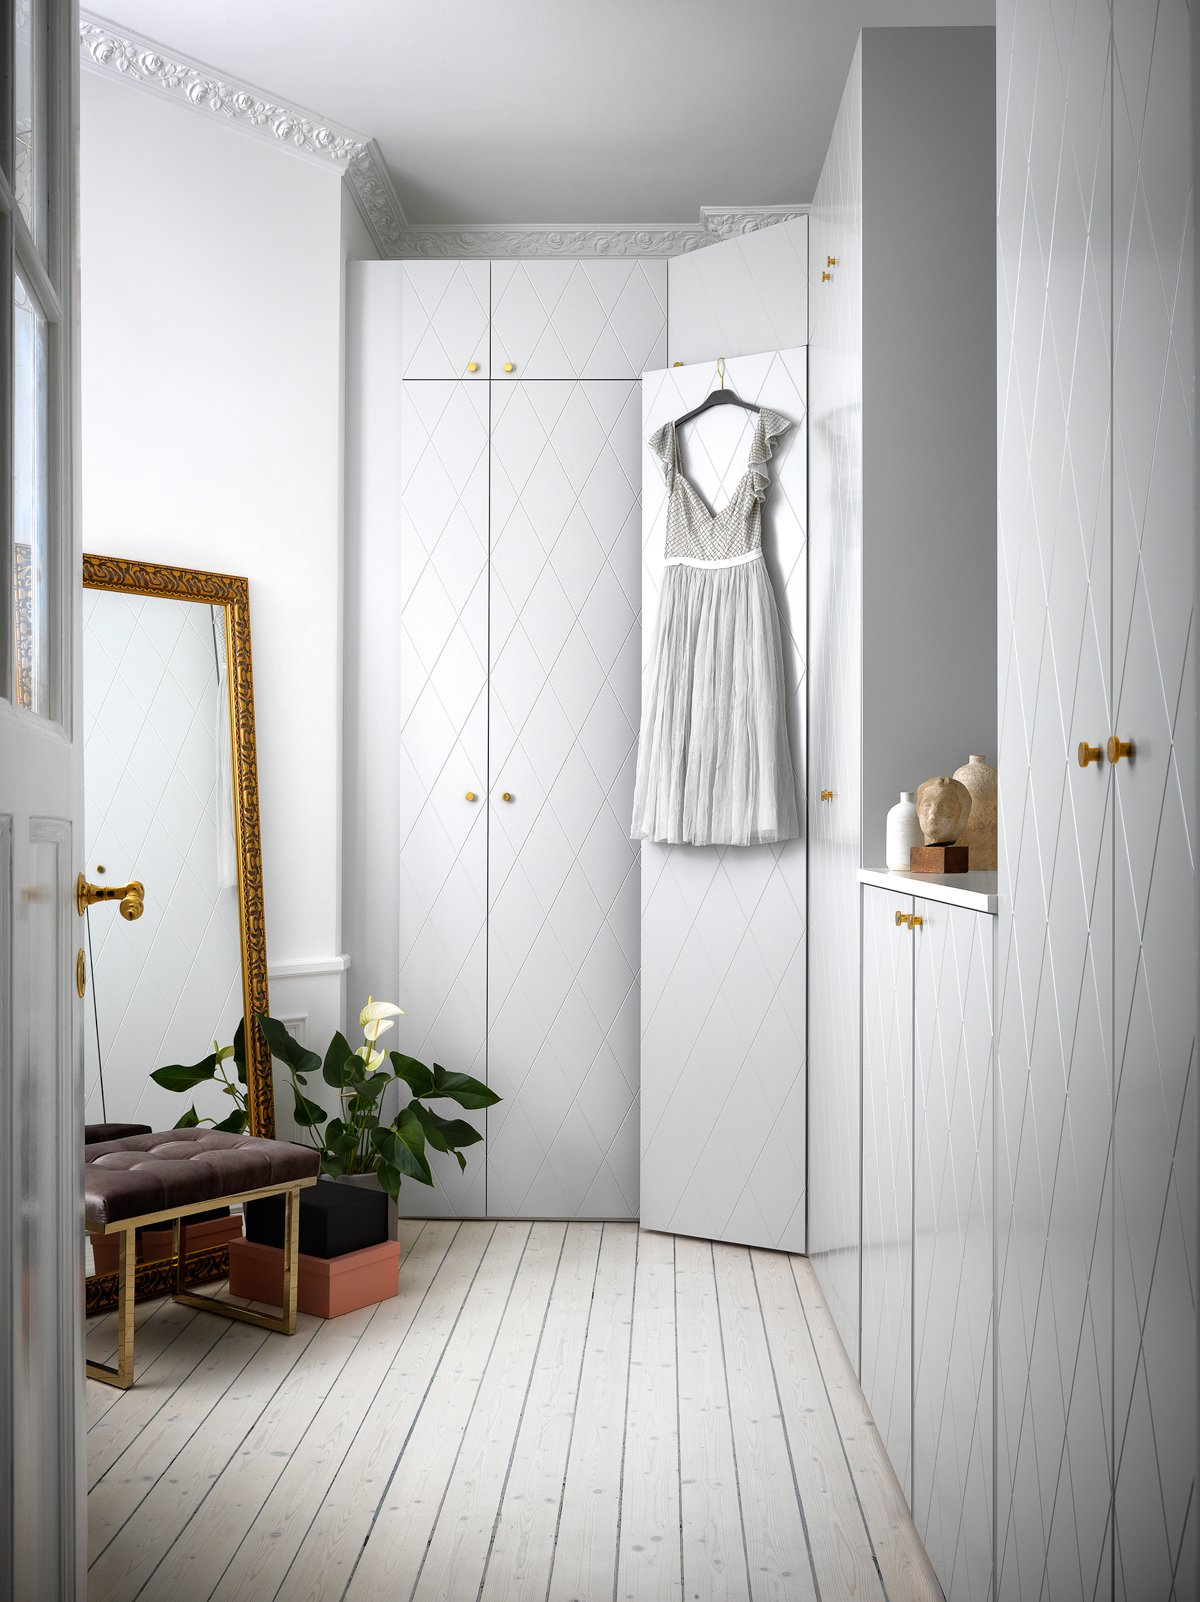 pax garderob dörr montering